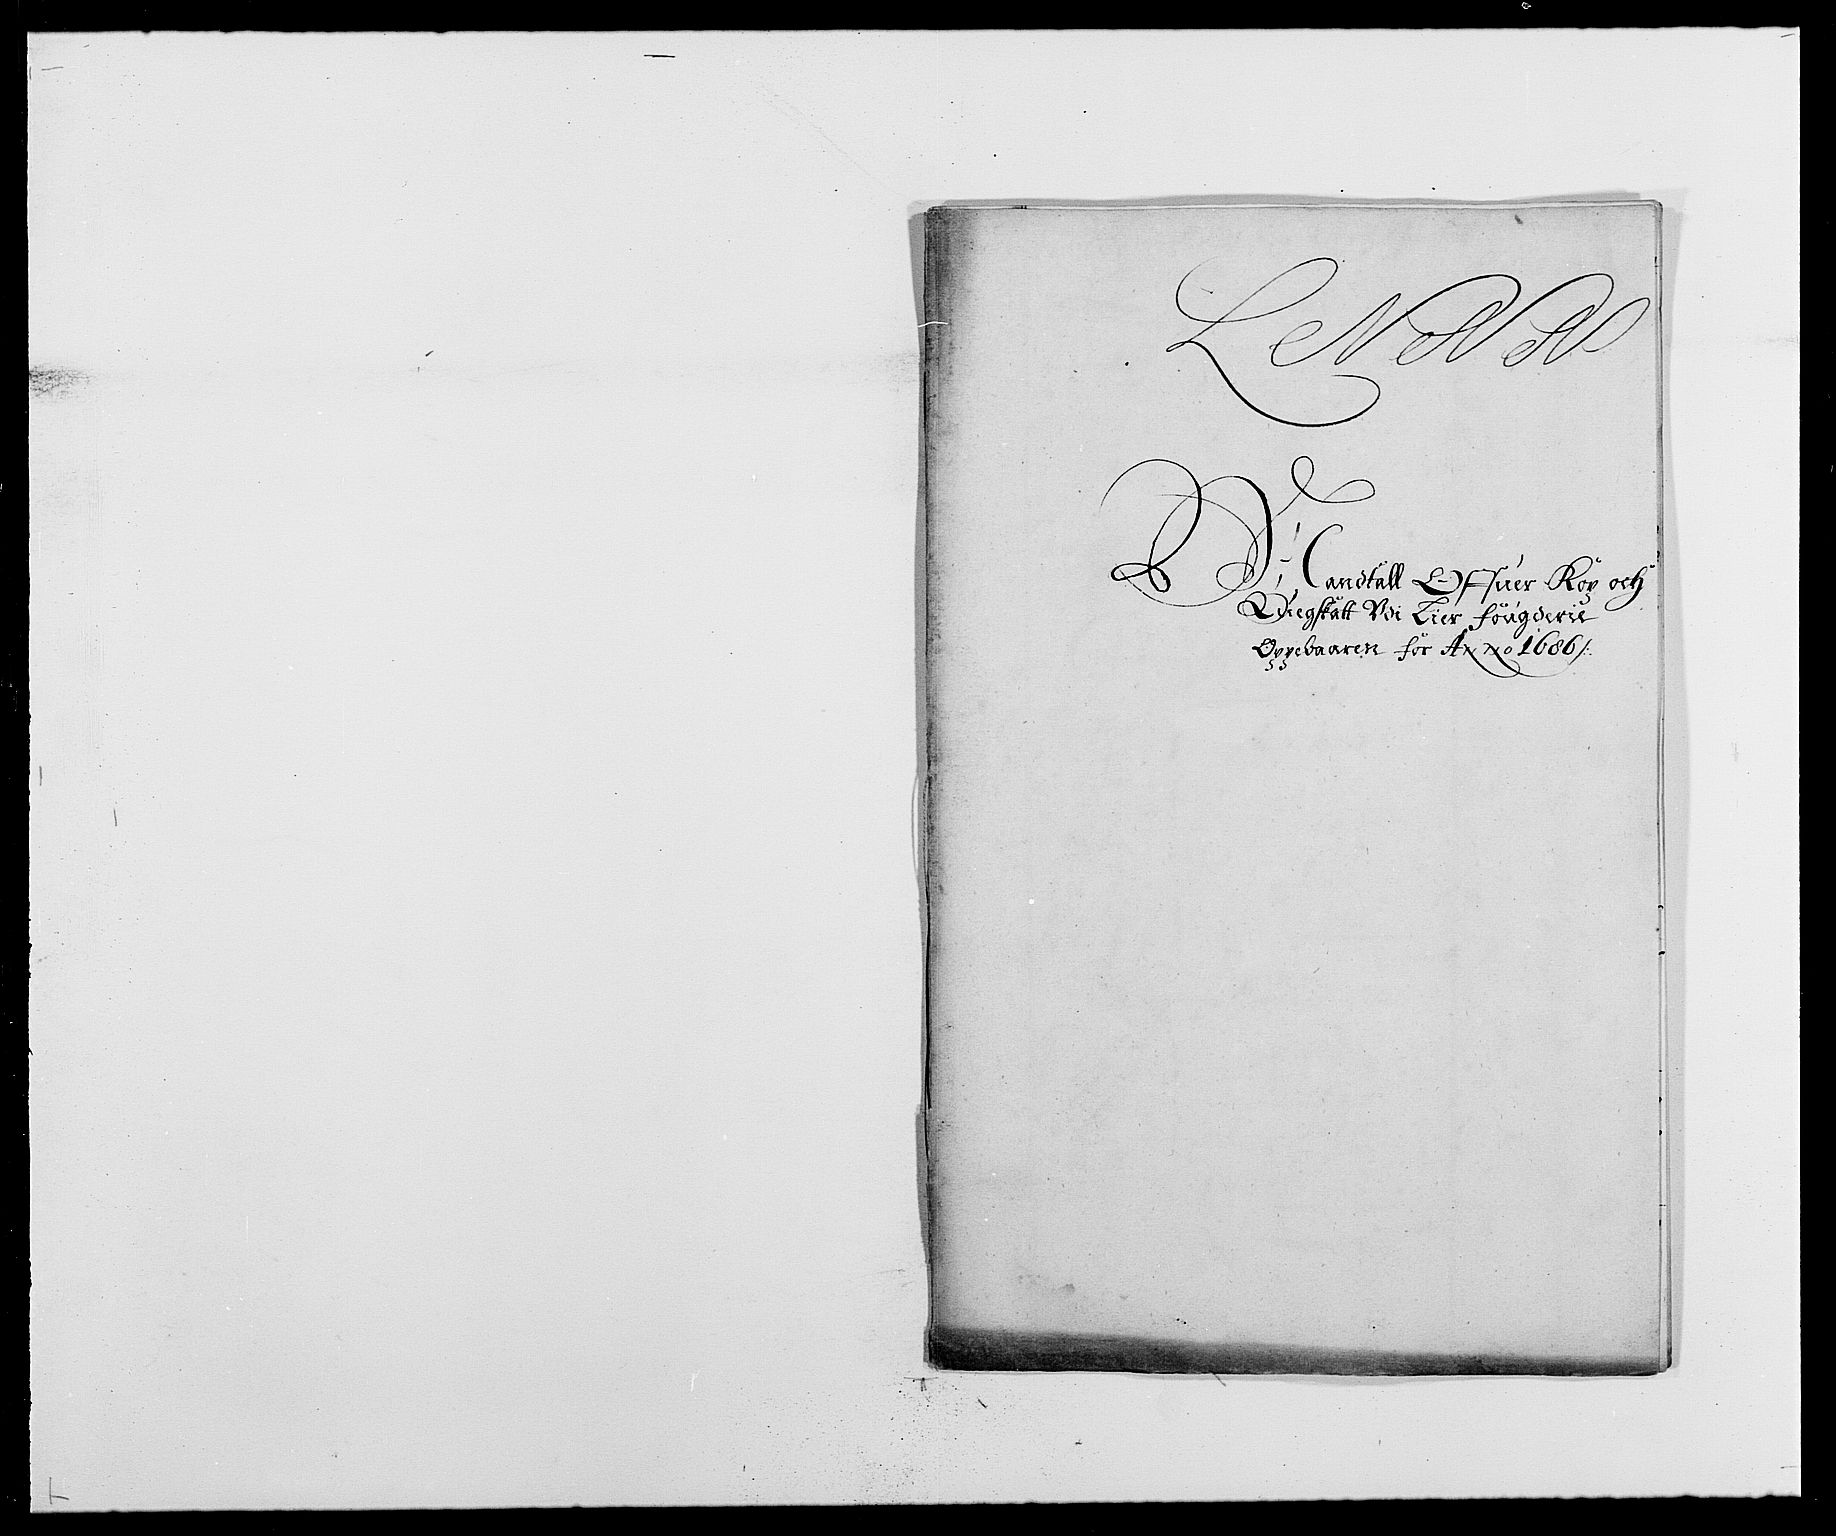 RA, Rentekammeret inntil 1814, Reviderte regnskaper, Fogderegnskap, R27/L1687: Fogderegnskap Lier, 1678-1686, s. 277